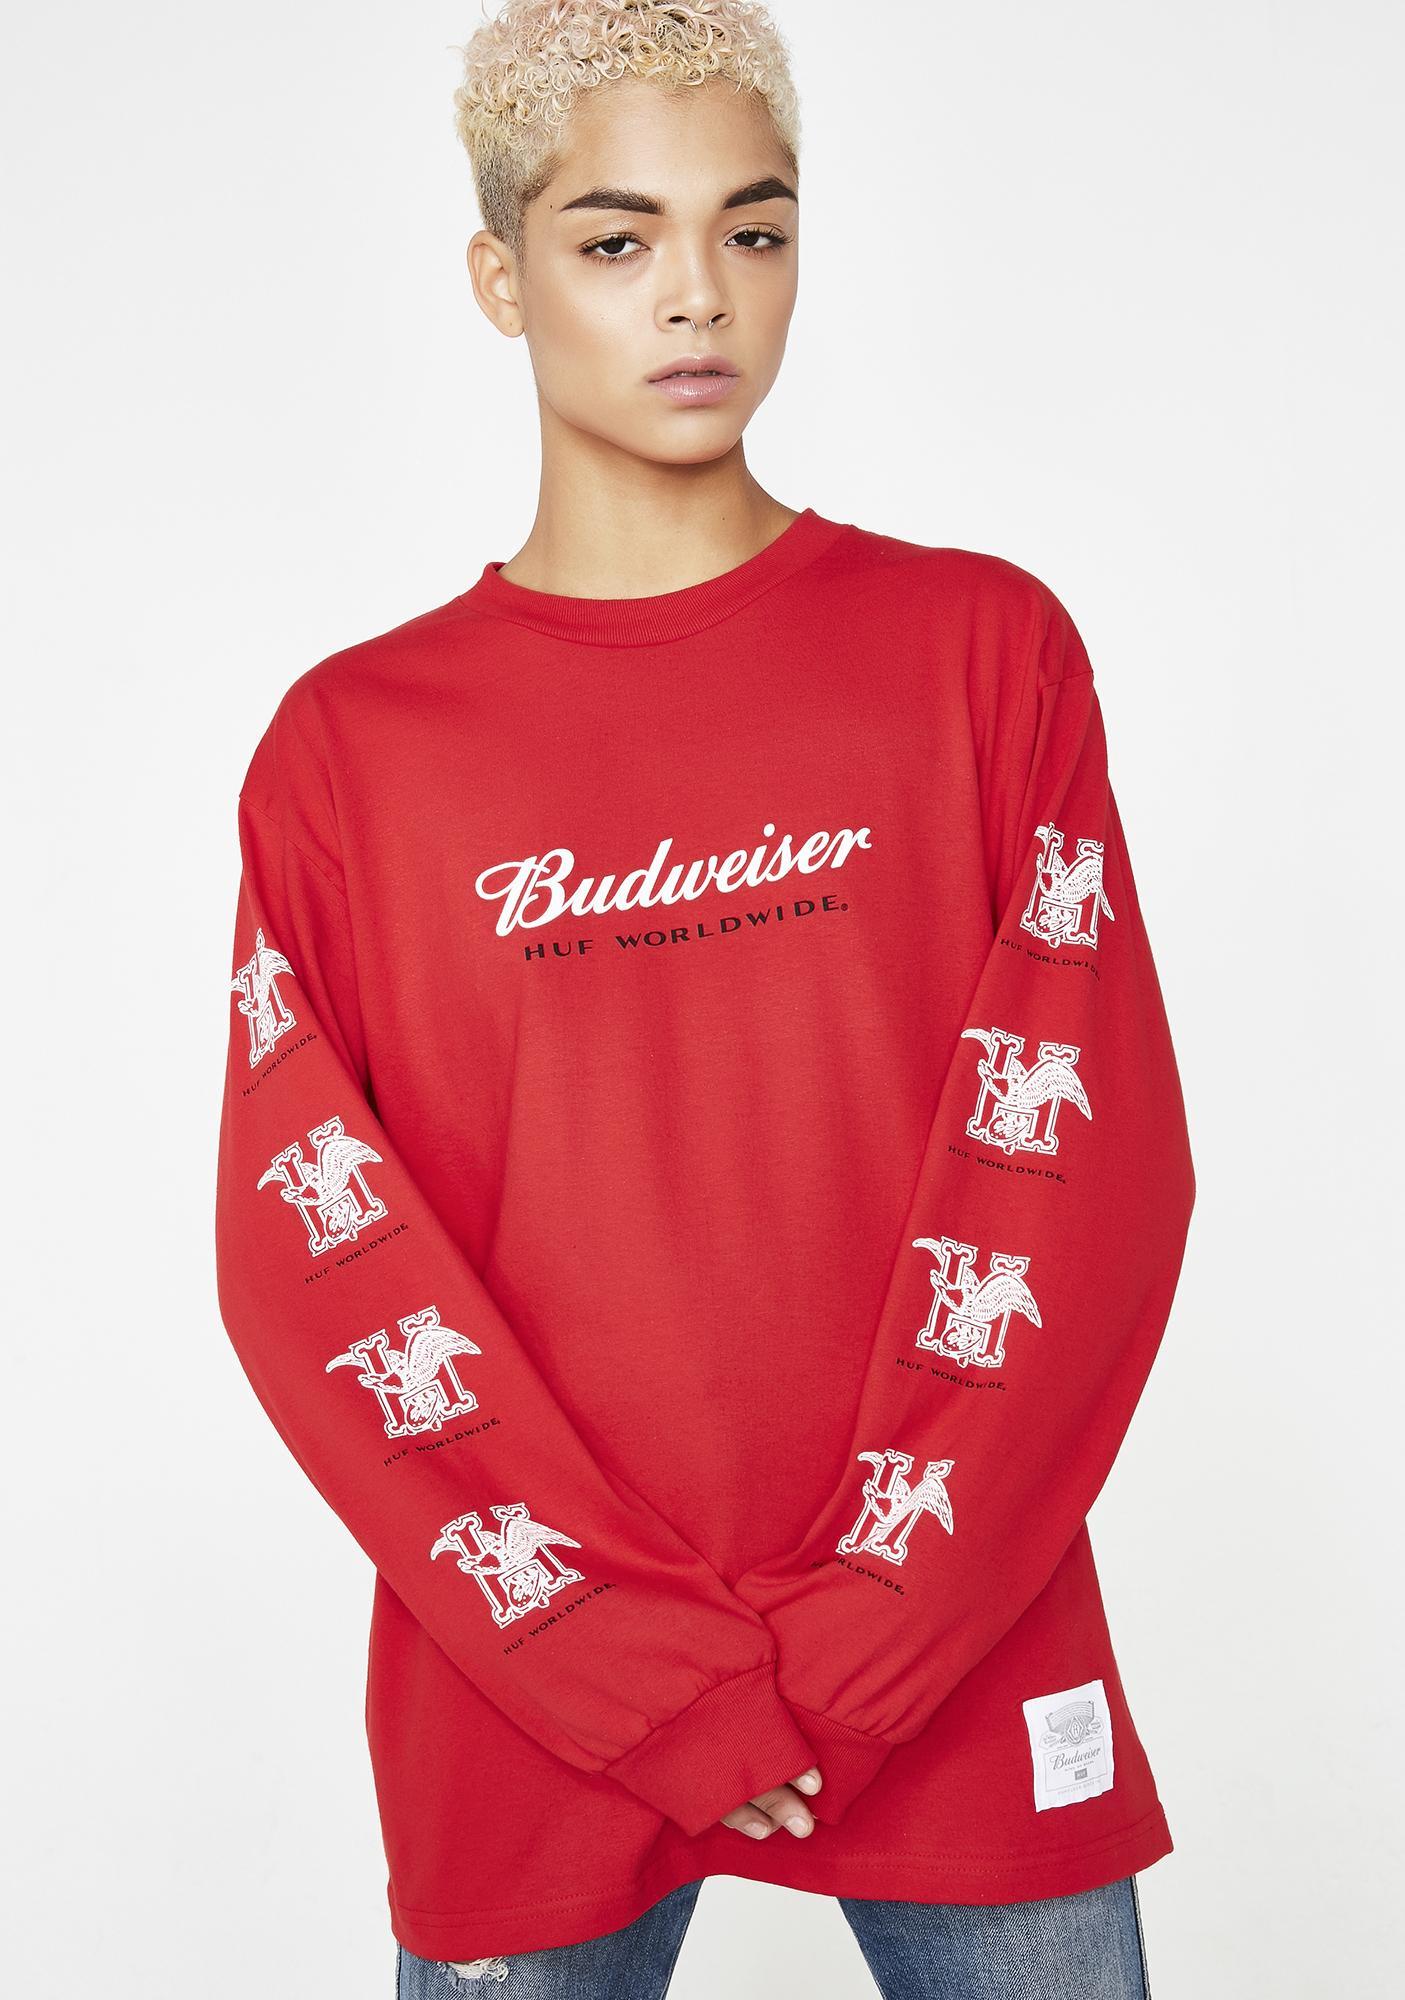 HUF x Budweiser Eagle Long Sleeve Tee